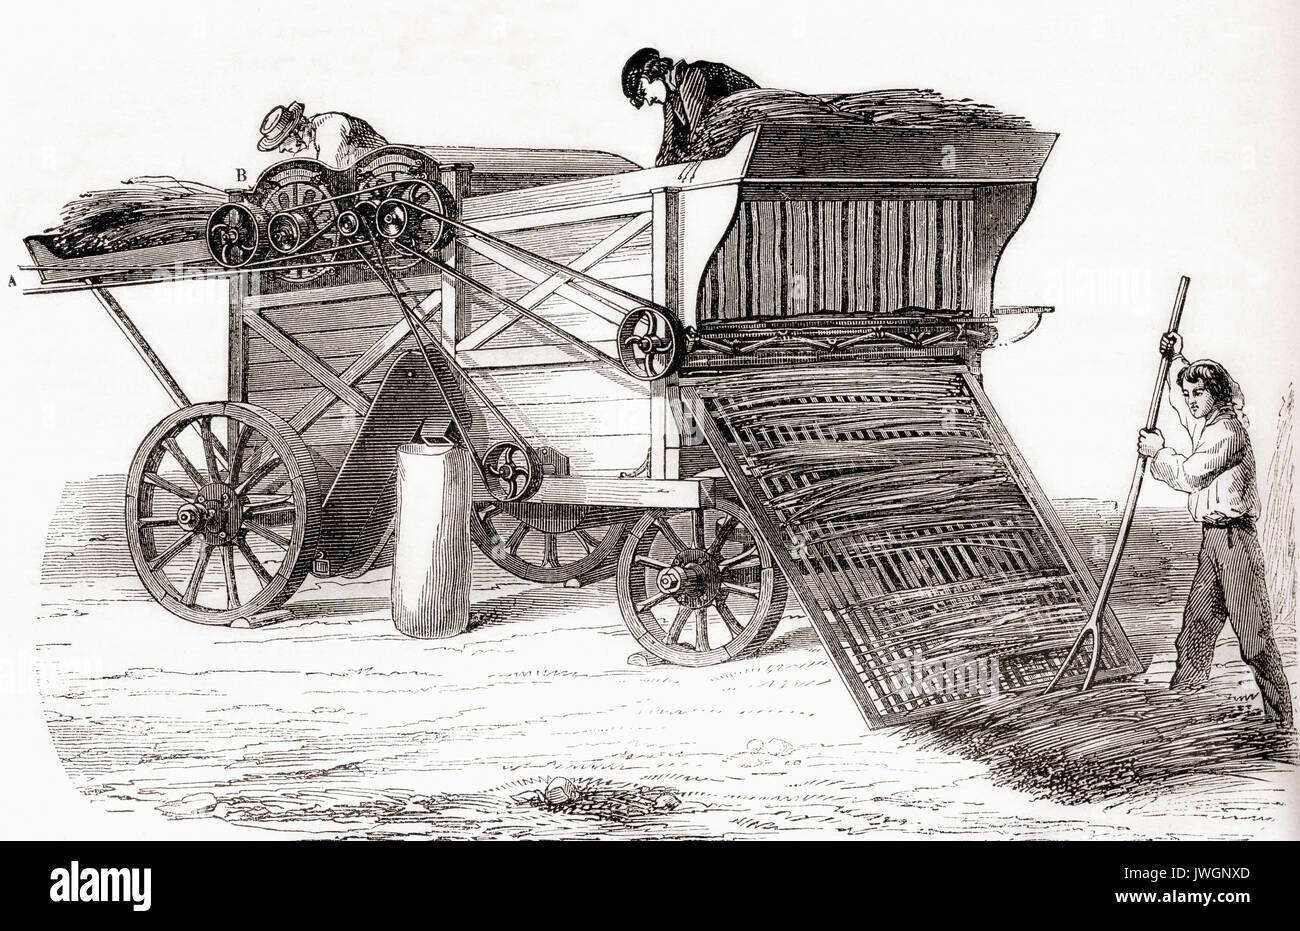 A 19th century threshing machine. From Les Merveilles de la ...